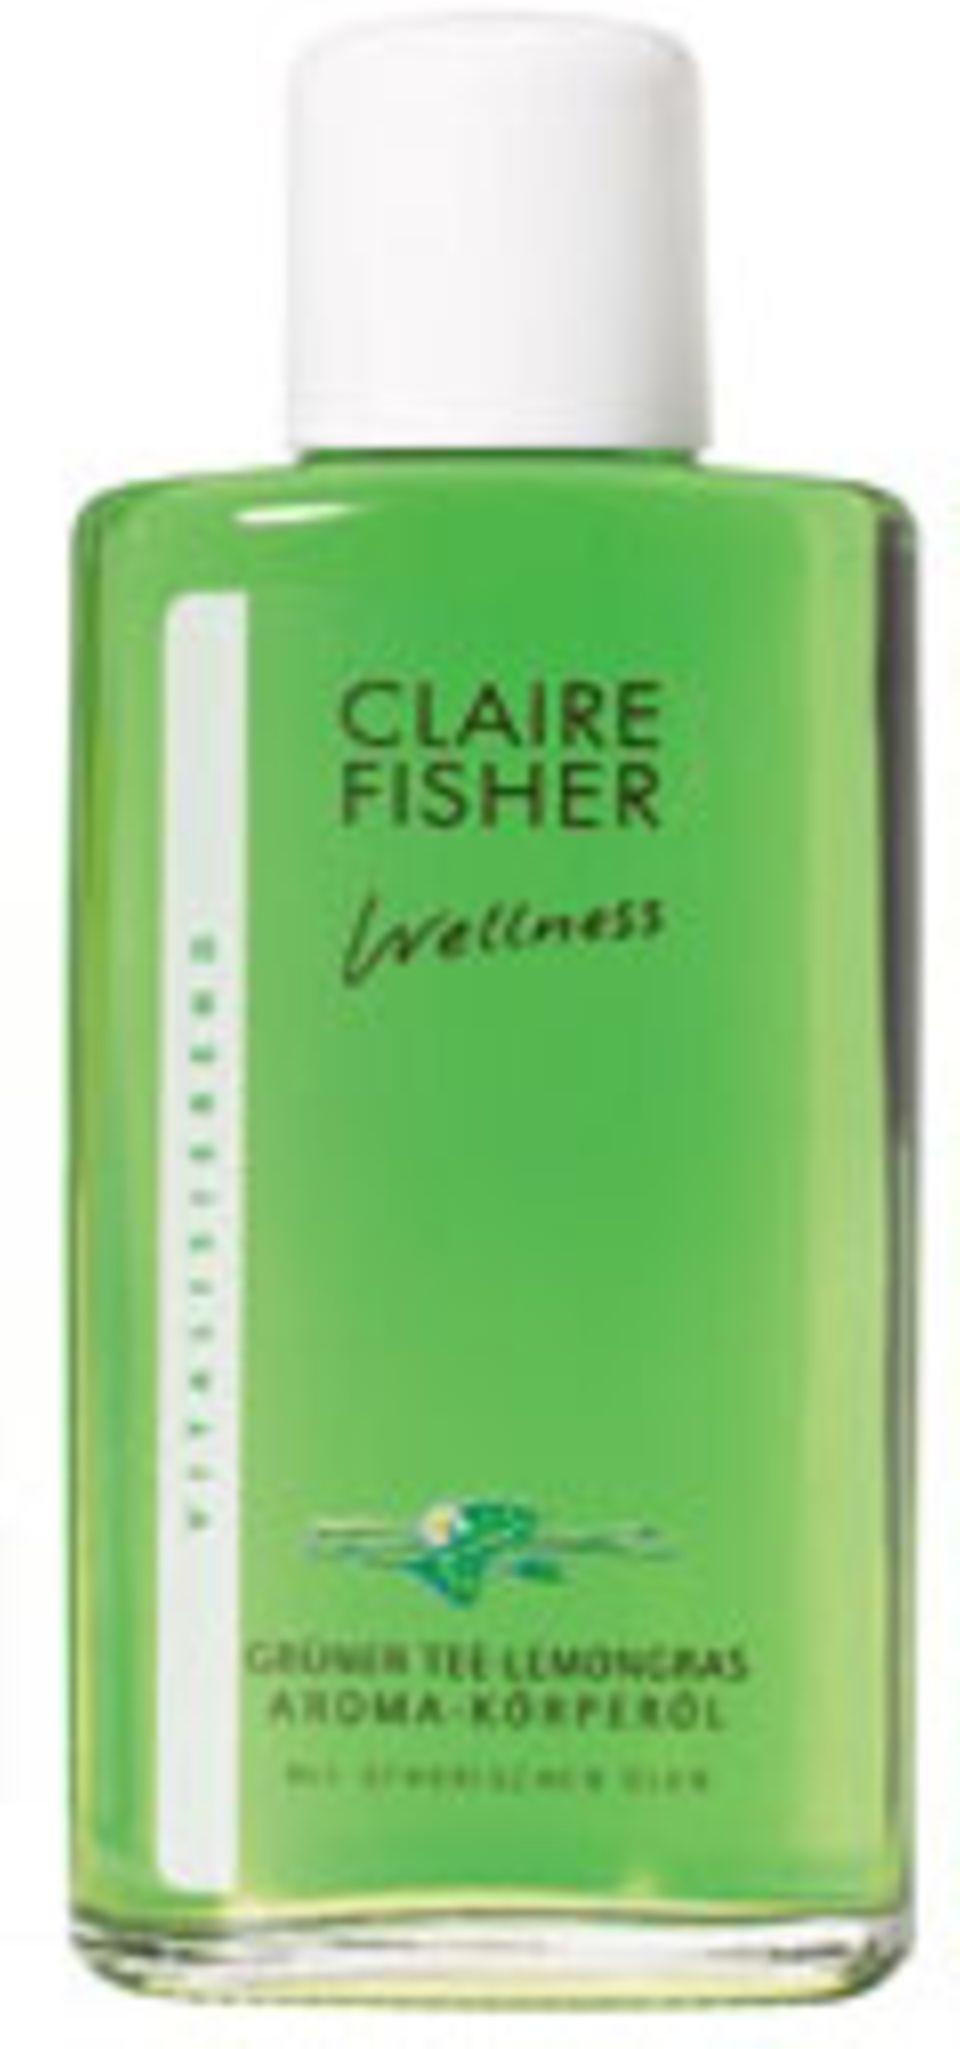 Grüner Tee-Lemongras Aroma-Körperöl von Claire Fisher